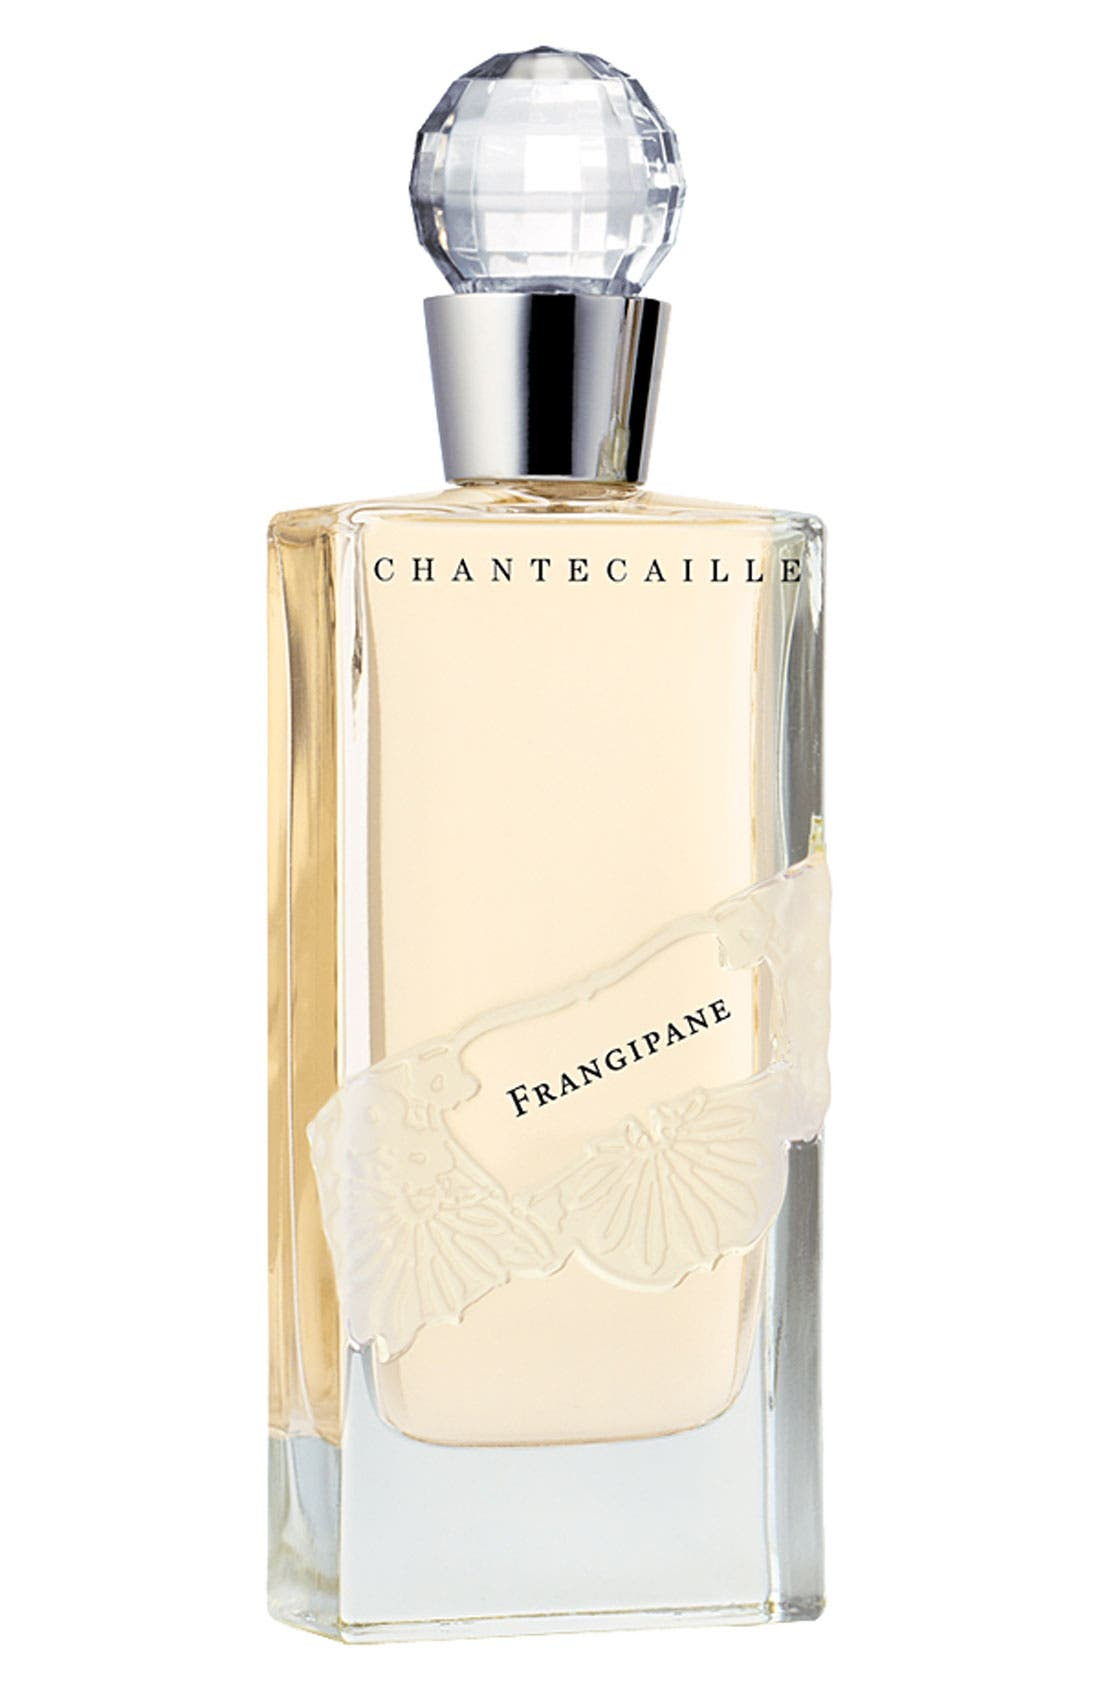 Chantecaille Frangipane Eau de Parfum